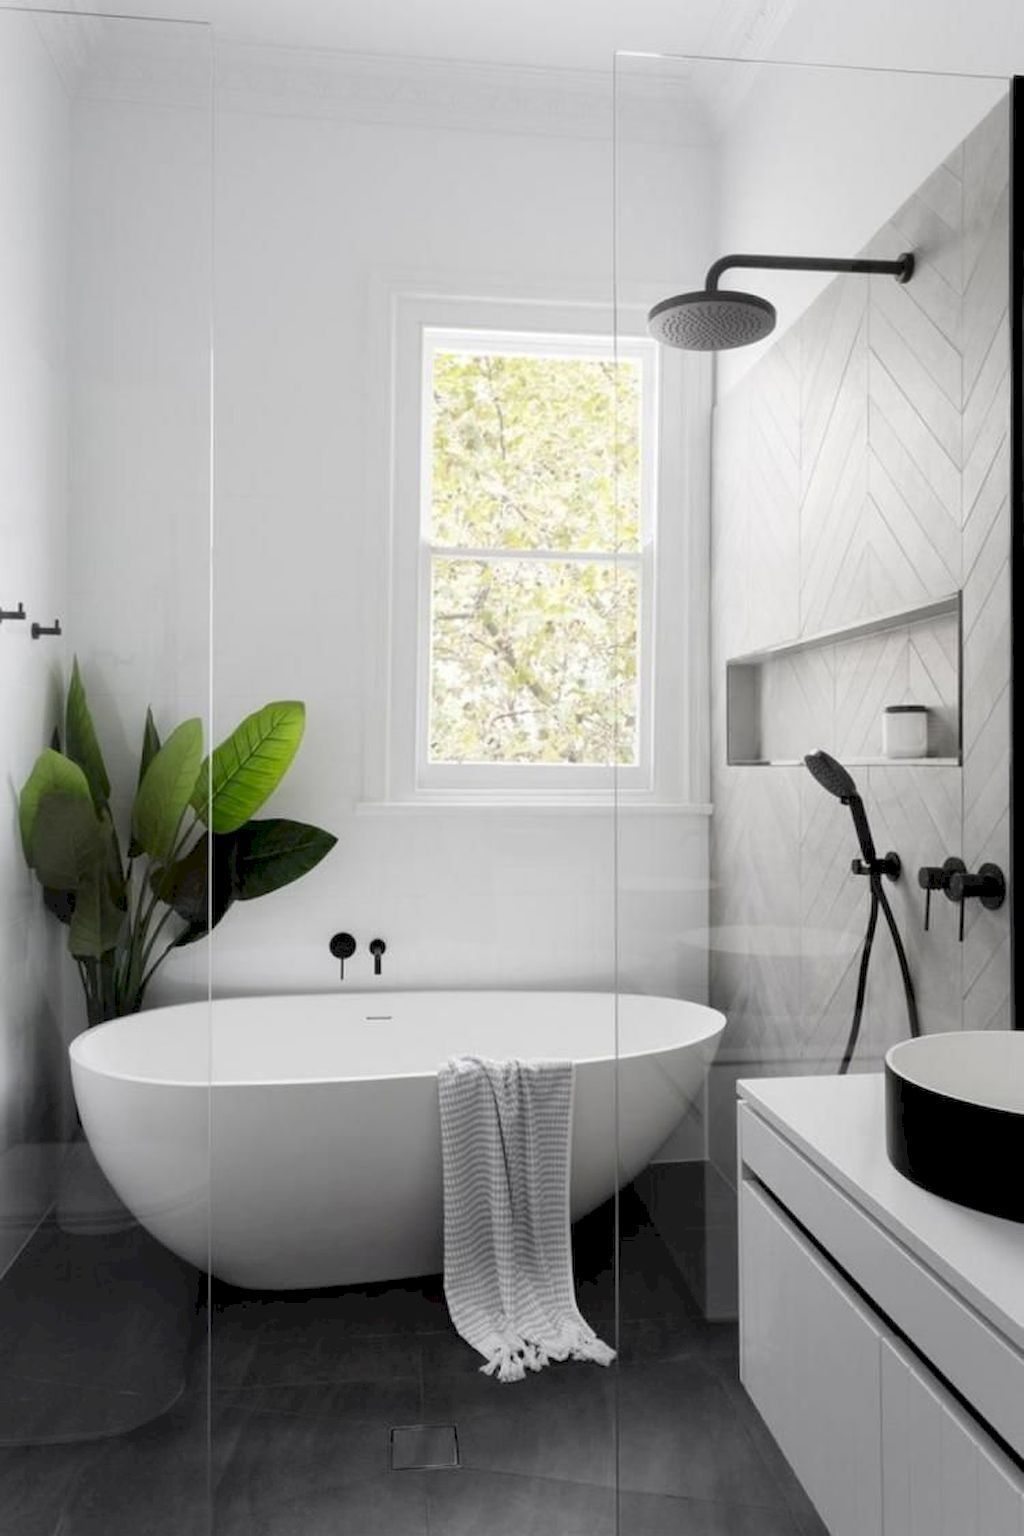 22+ Best Scandinavian Bathroom Ideas You Should Know | Scandinavian ...